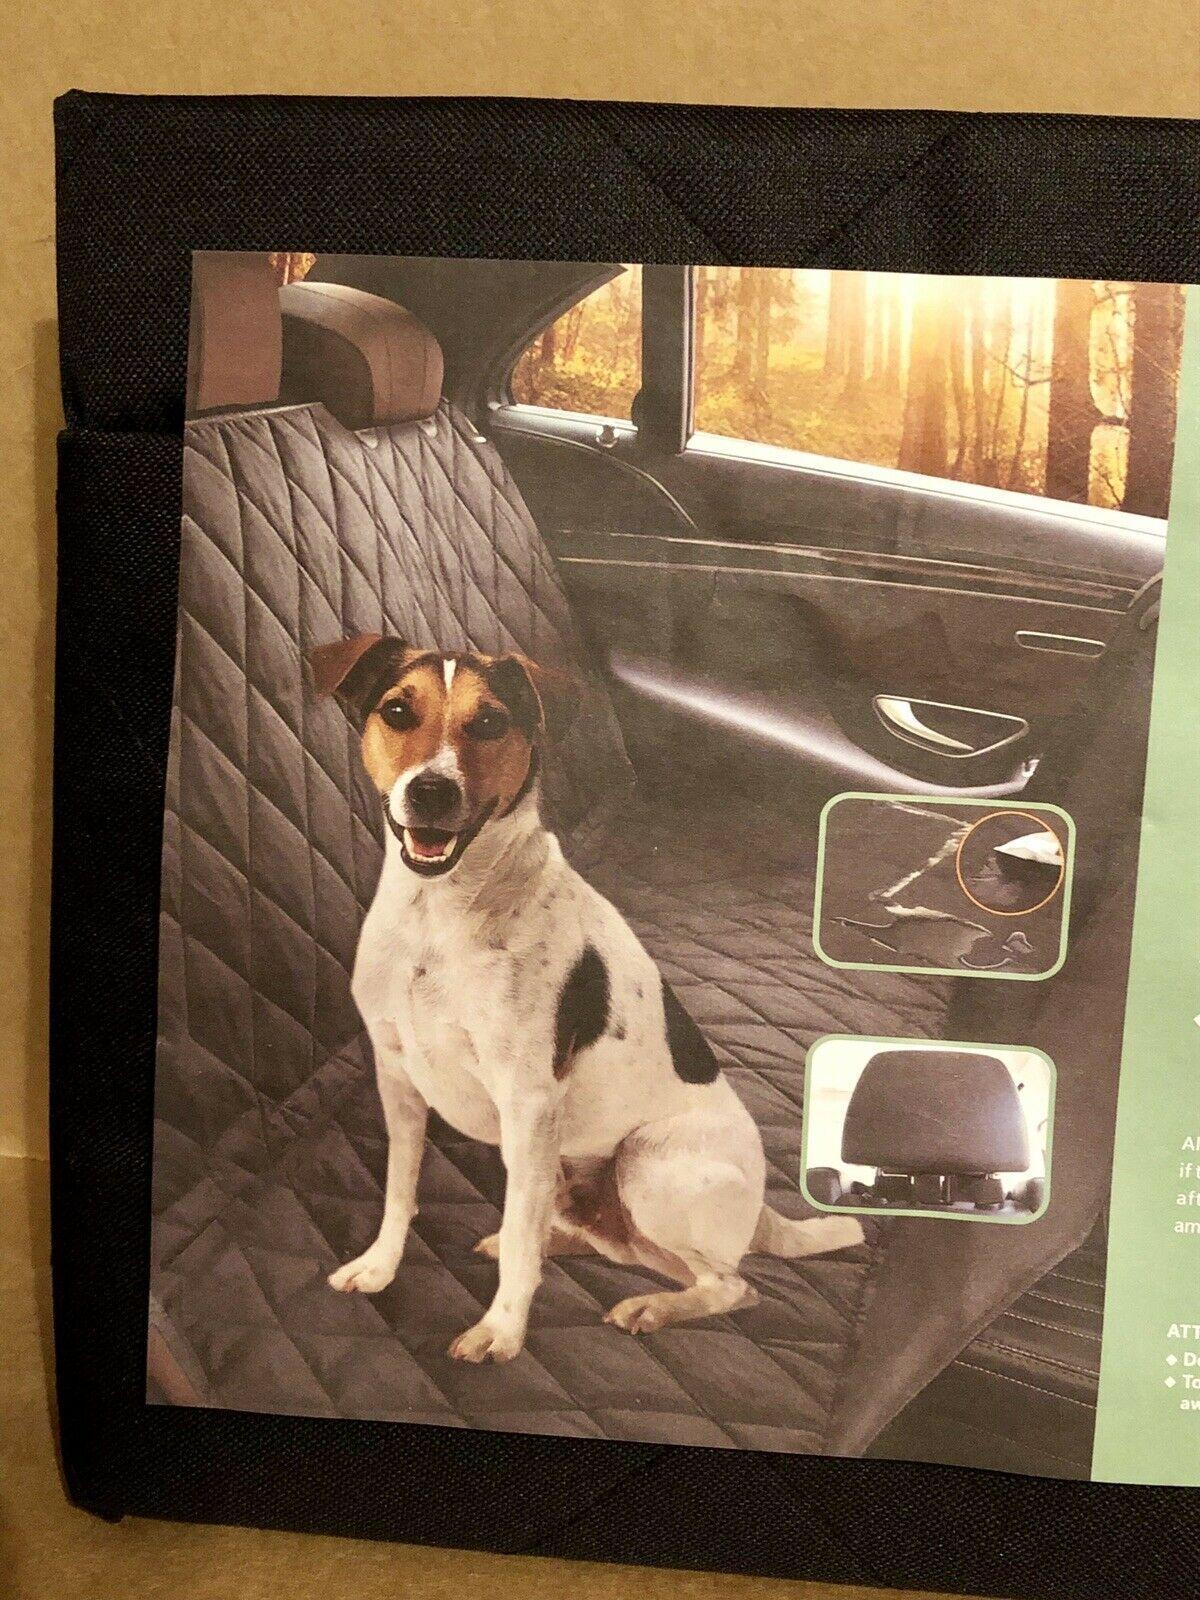 Car Pet Seat Cover Dog Cat Black 58x54 Heavy Duty Nonslip Back Velcro Closure